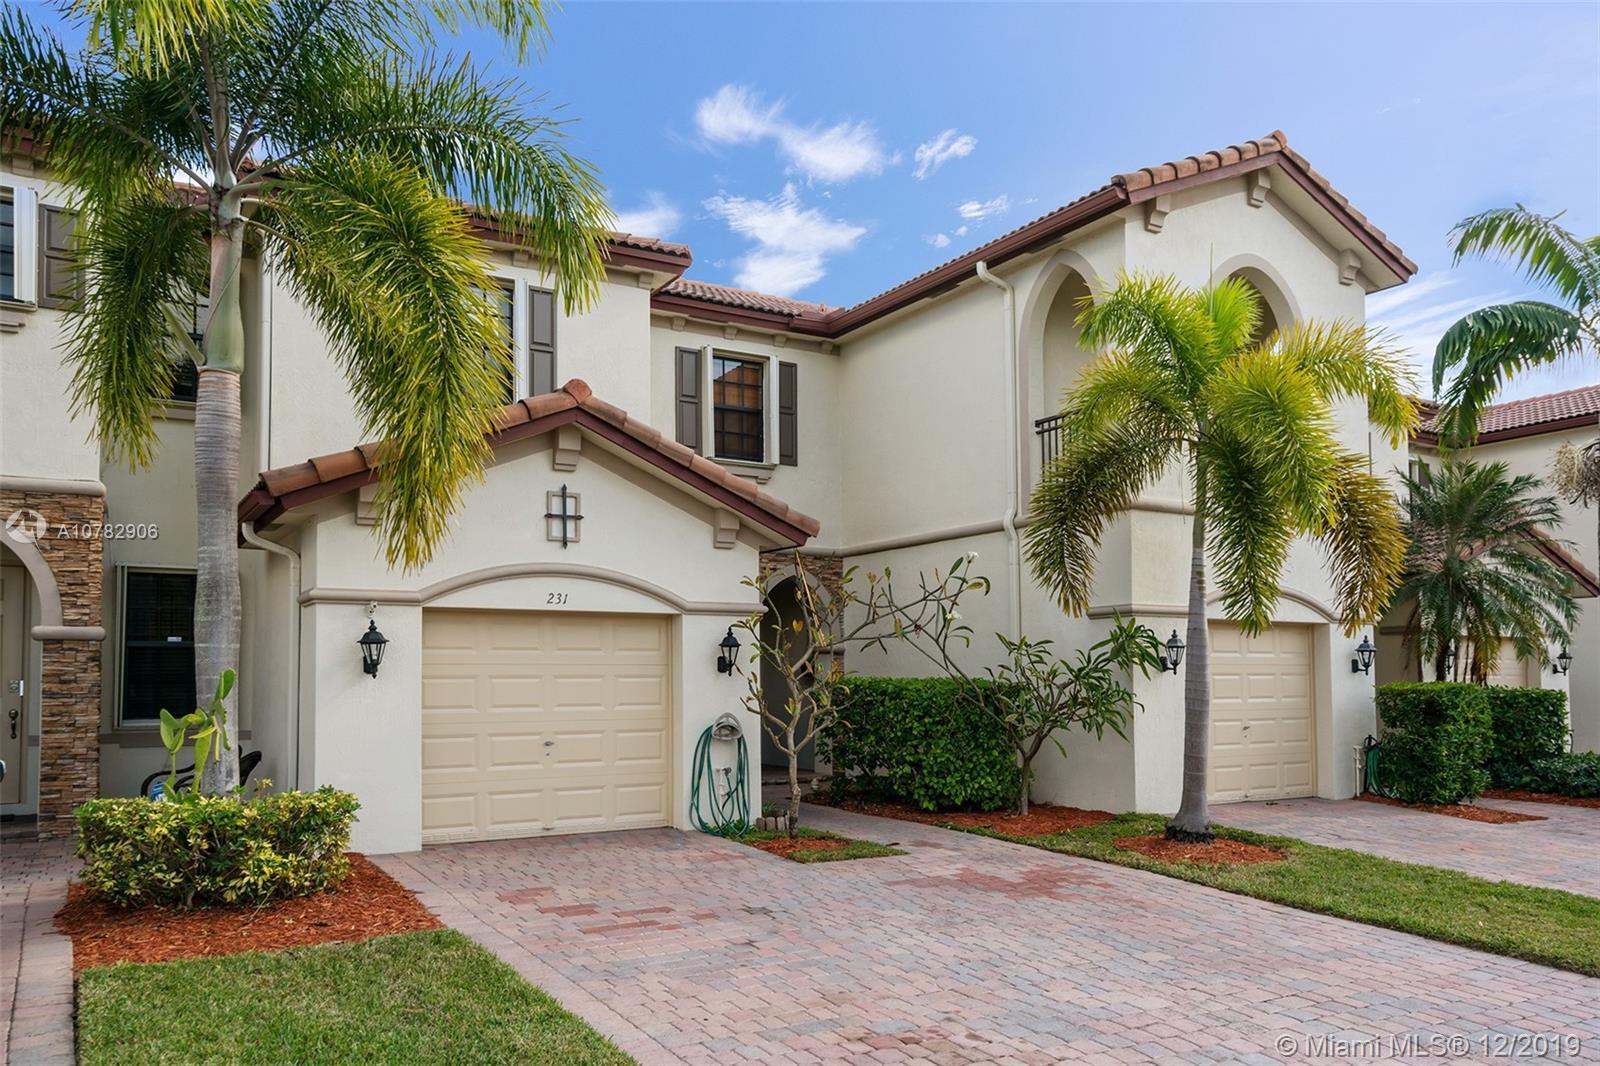 231 SE 37th Pl #0, Homestead, FL 33033 - Homestead, FL real estate listing